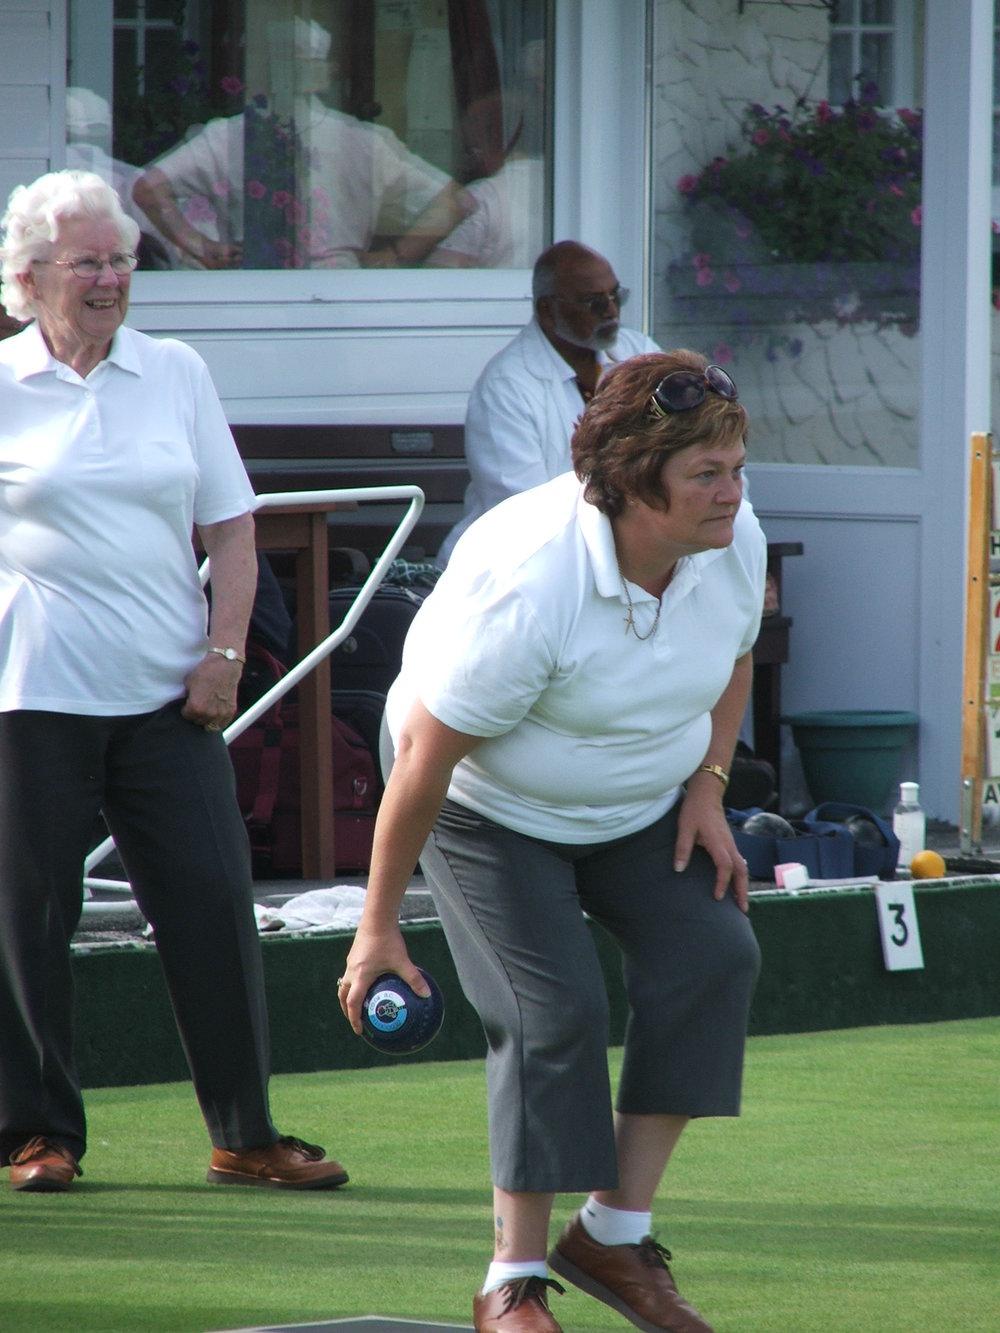 torquay bowls tour 2009 008.JPG